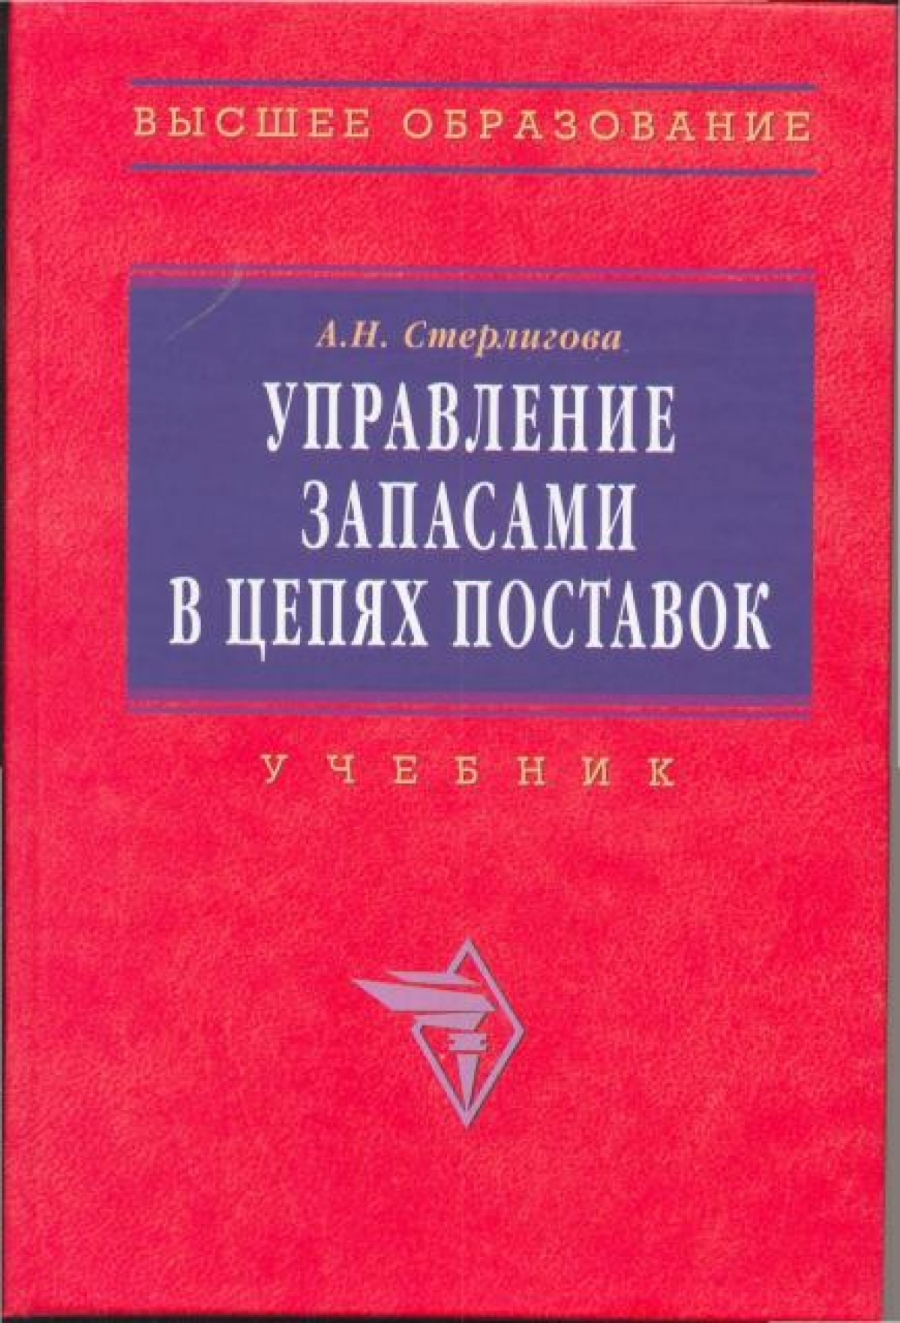 Обложка книги:  а.н. стерлигова - управление запасами в цепях поставок